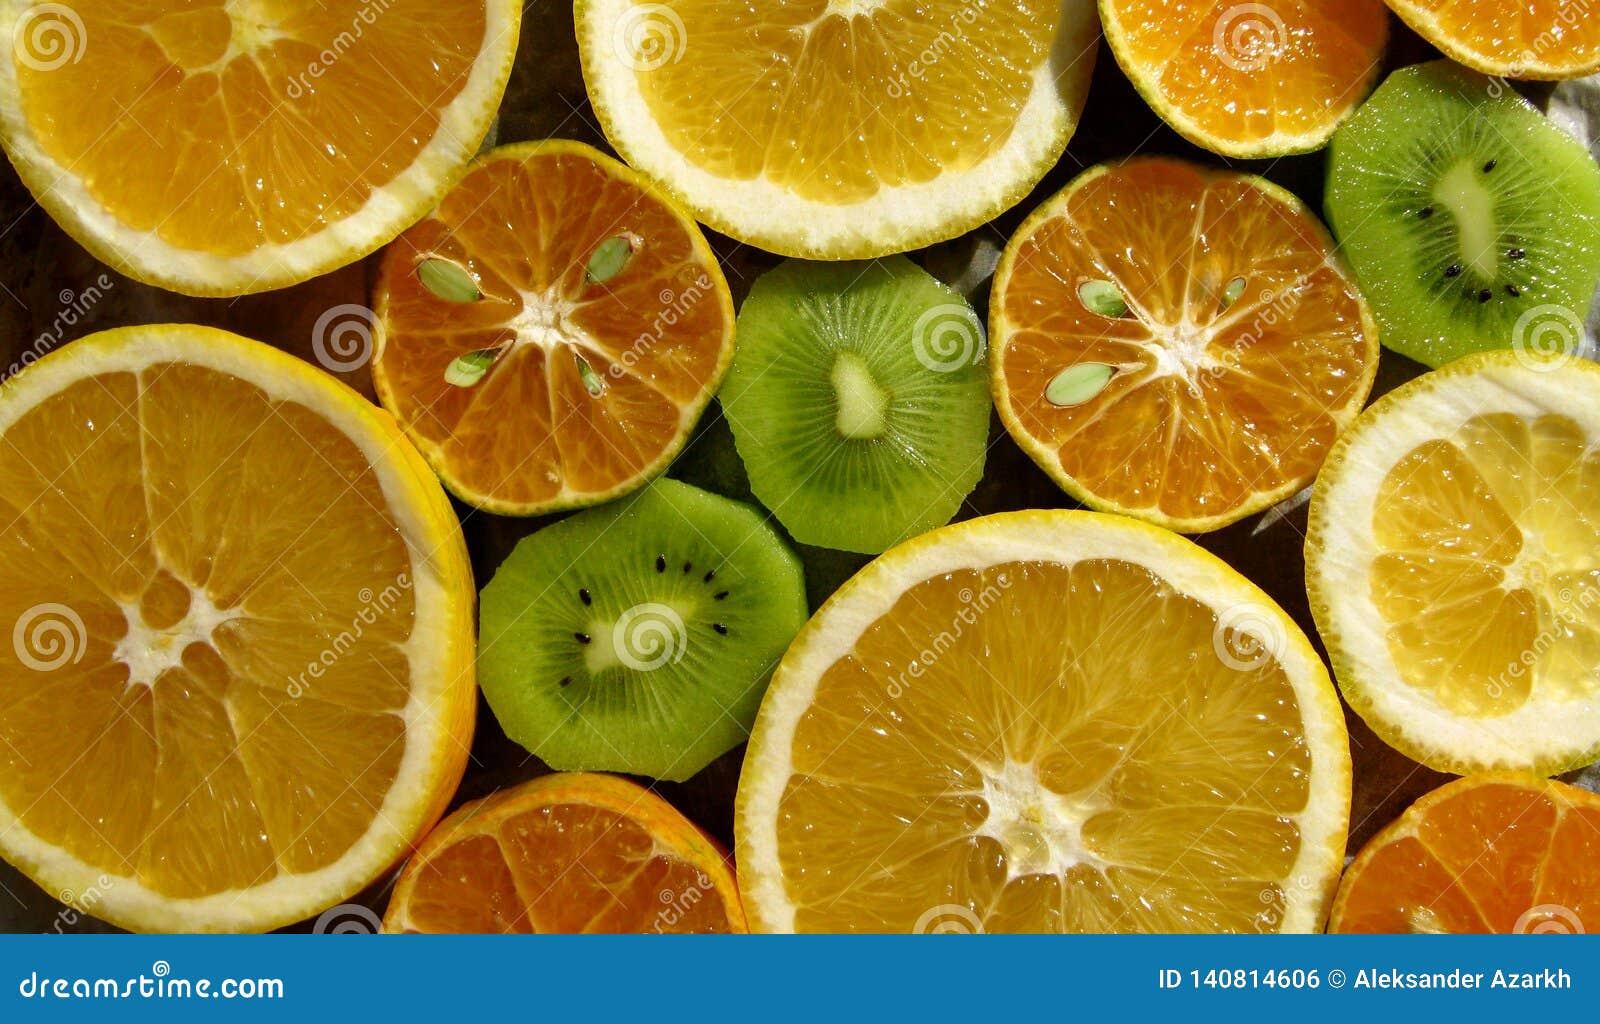 Nytt orange citrusfruktsnitt